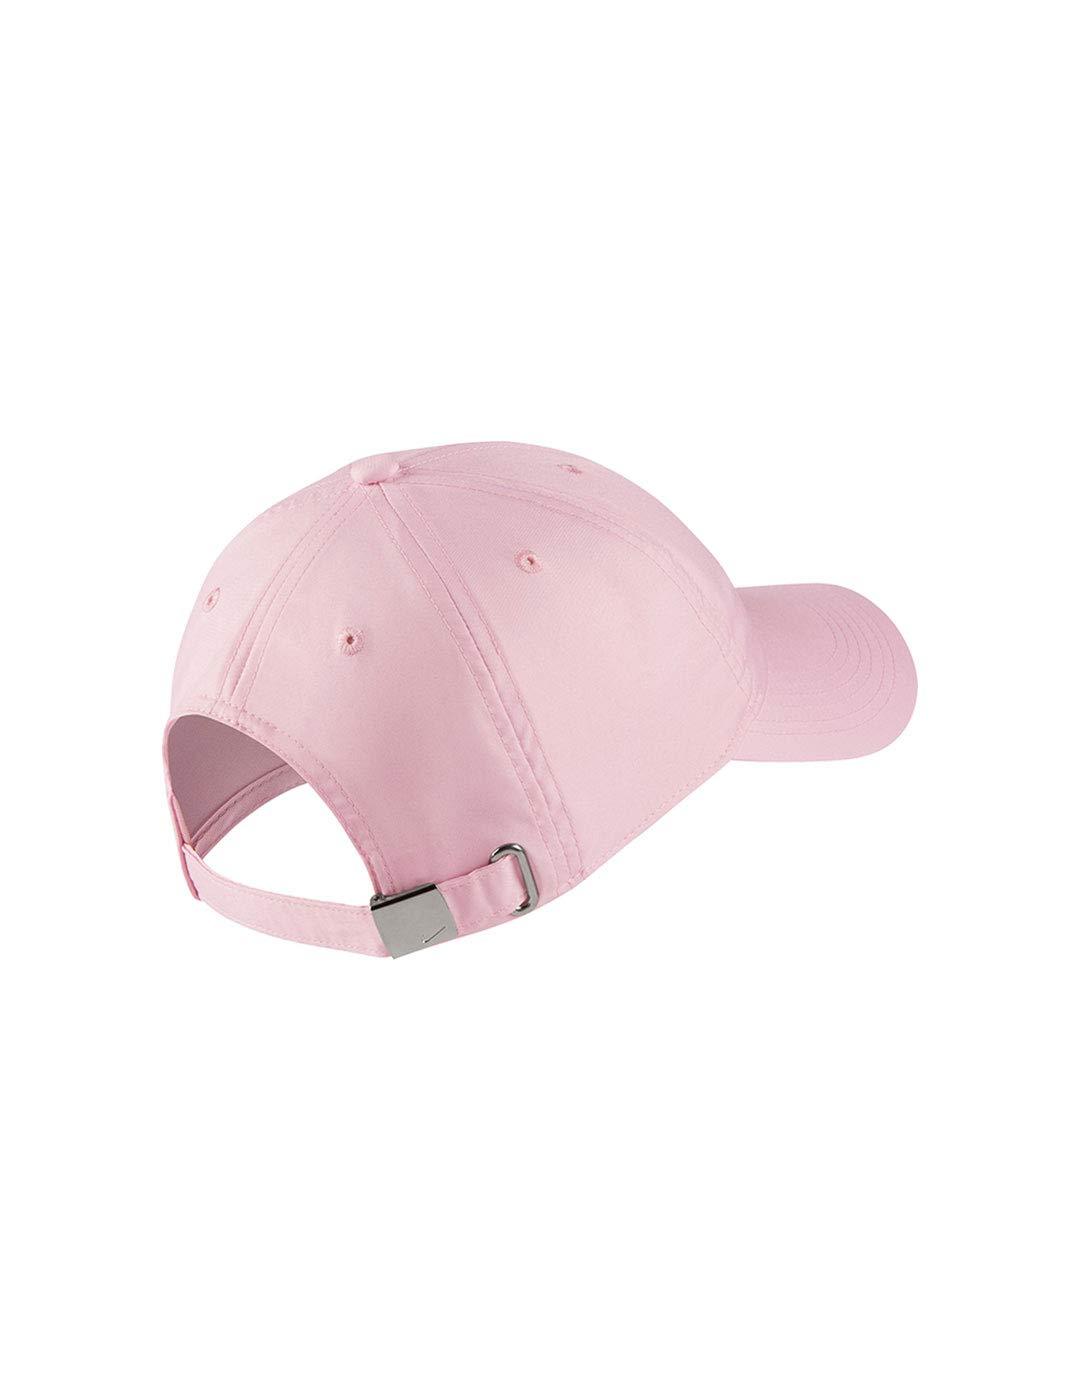 Nike Heritage86 cap Metal Swoosh Pink Foam//Metallic Silver 663 Taglia Unica Cappellopello Bambina Rosa